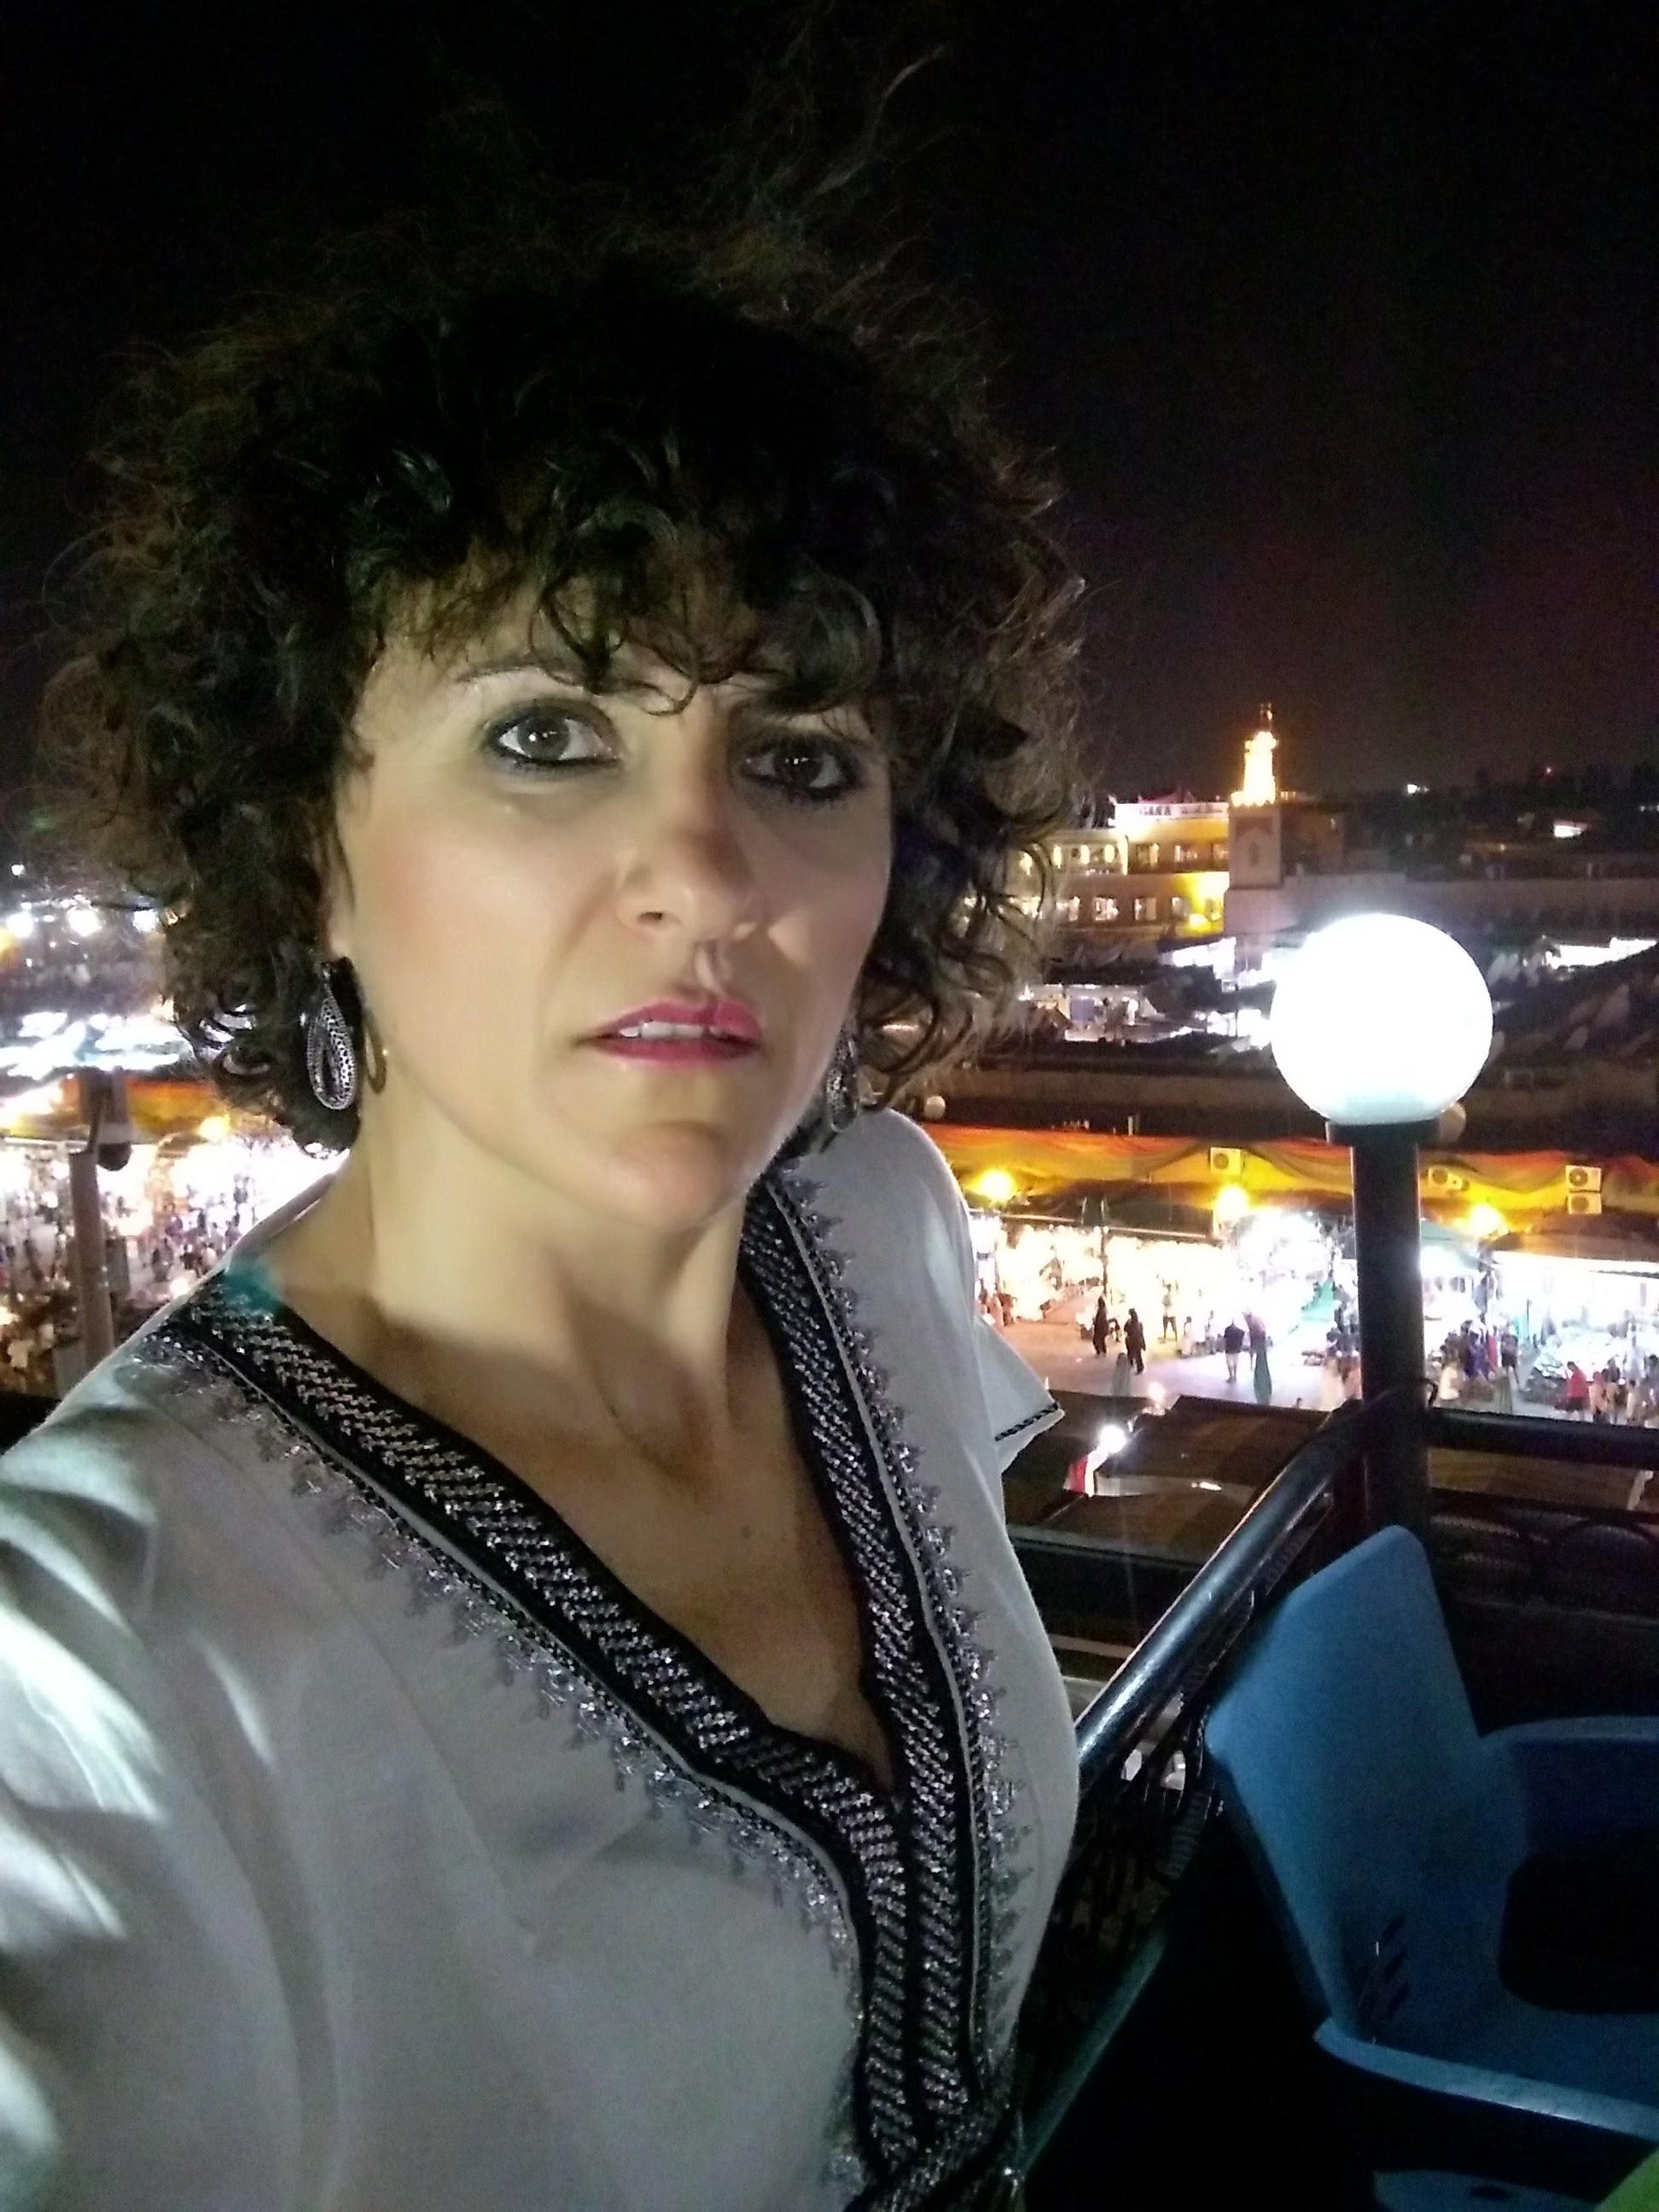 Miss Clov, Rebeca Valdivia, personal shopper, travel, trip, Moroco, Sahara, Atlas, Marrueco, desierto del Sahara, desert, Marrakech, zoco, sunset, terrazas